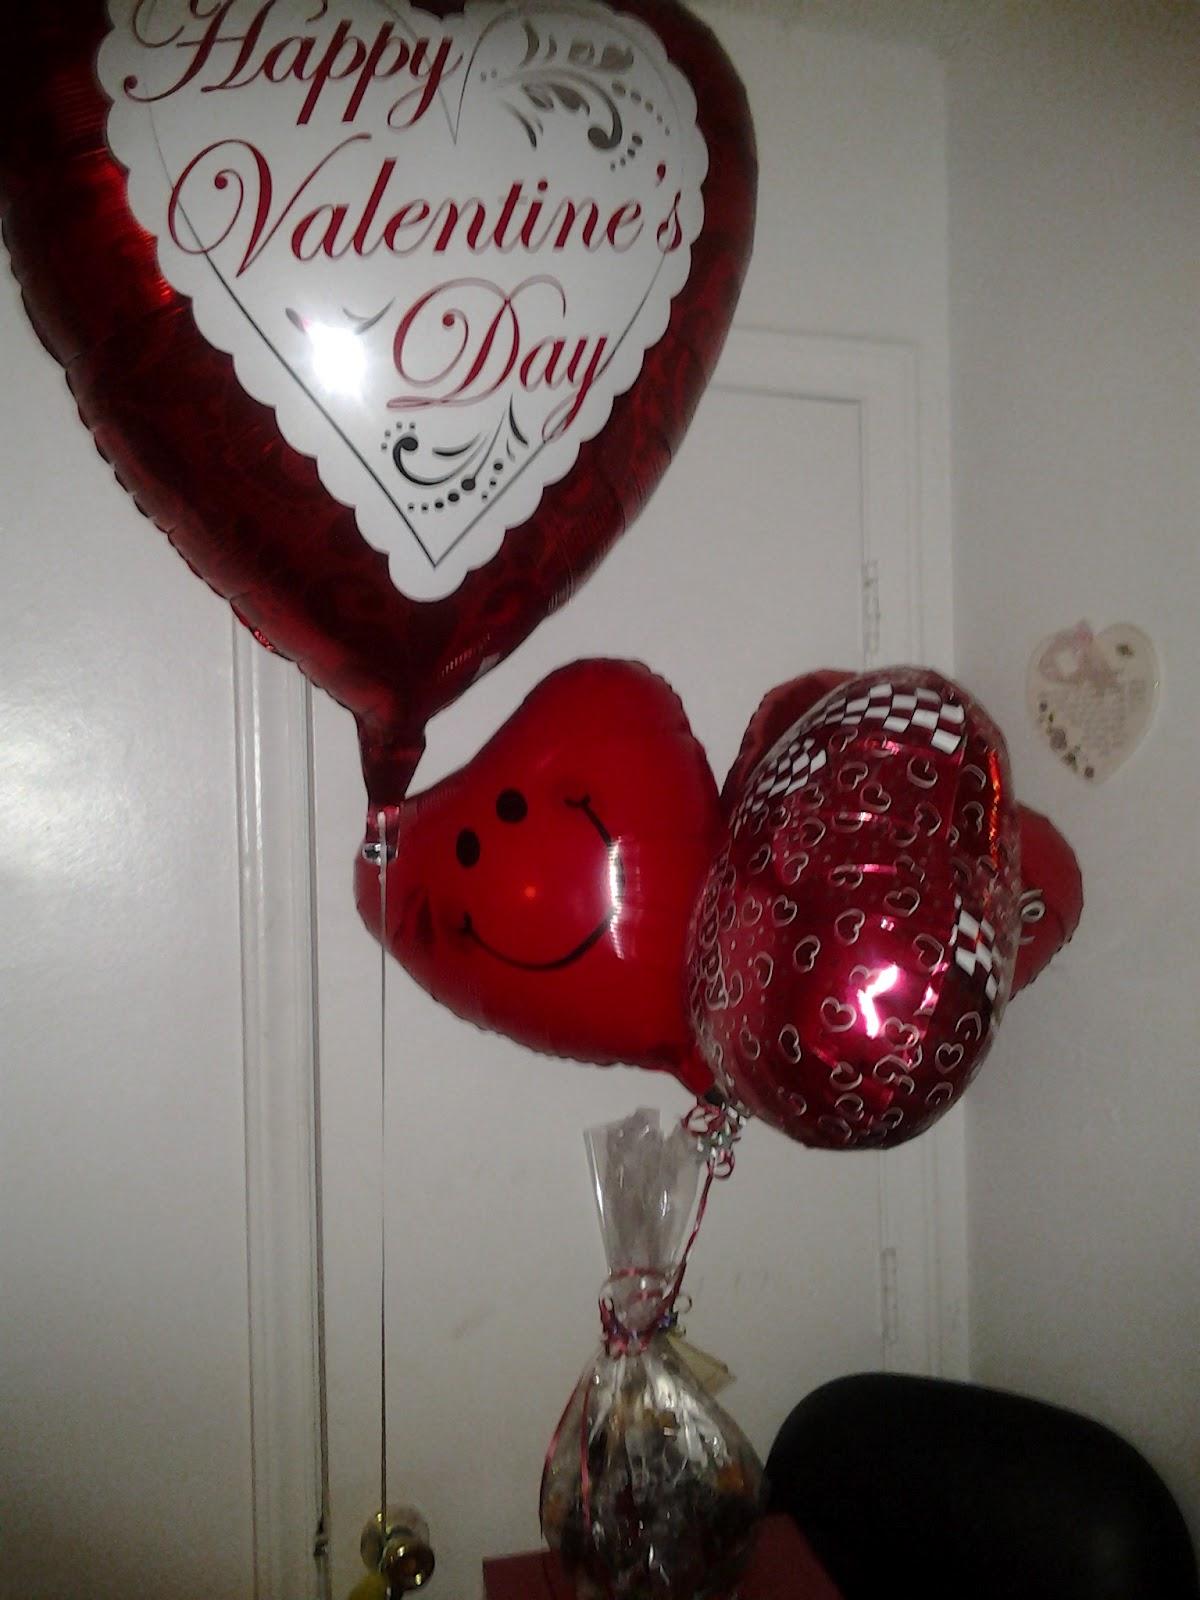 Valentines Day in South Africa  Valentine Celebration in